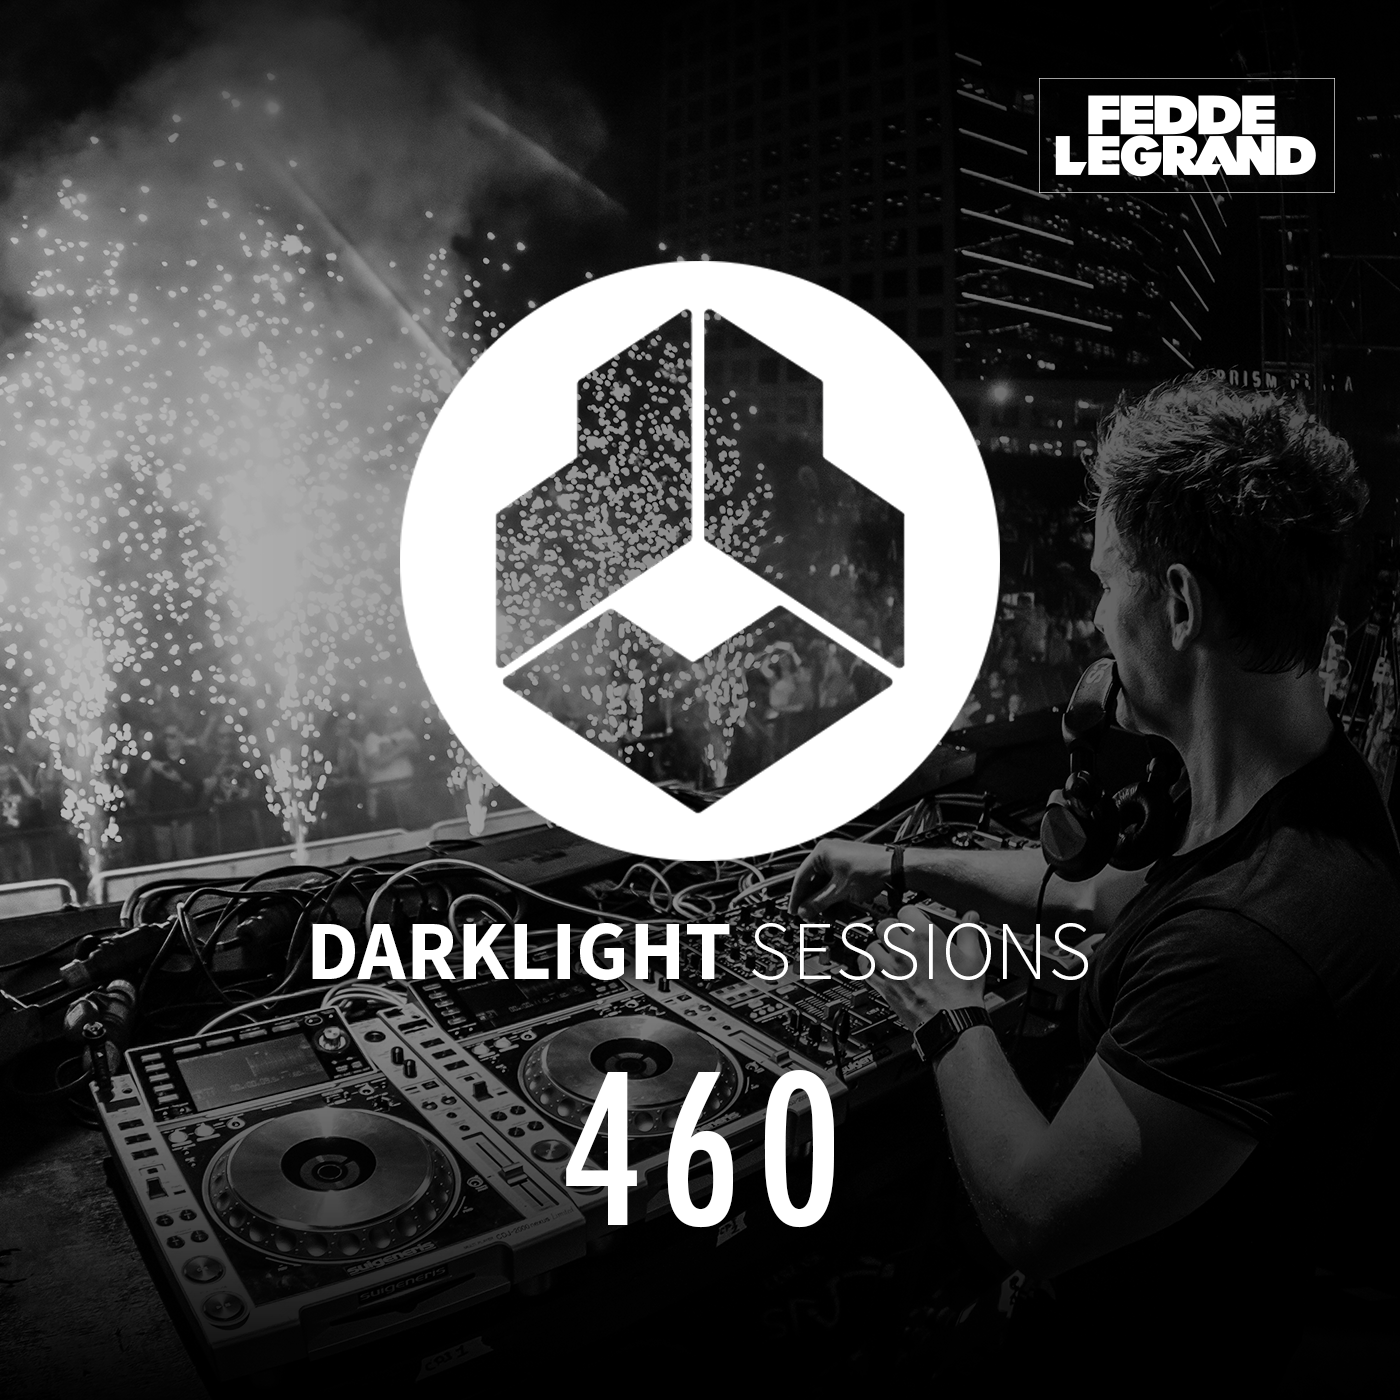 Darklight Sessions 460